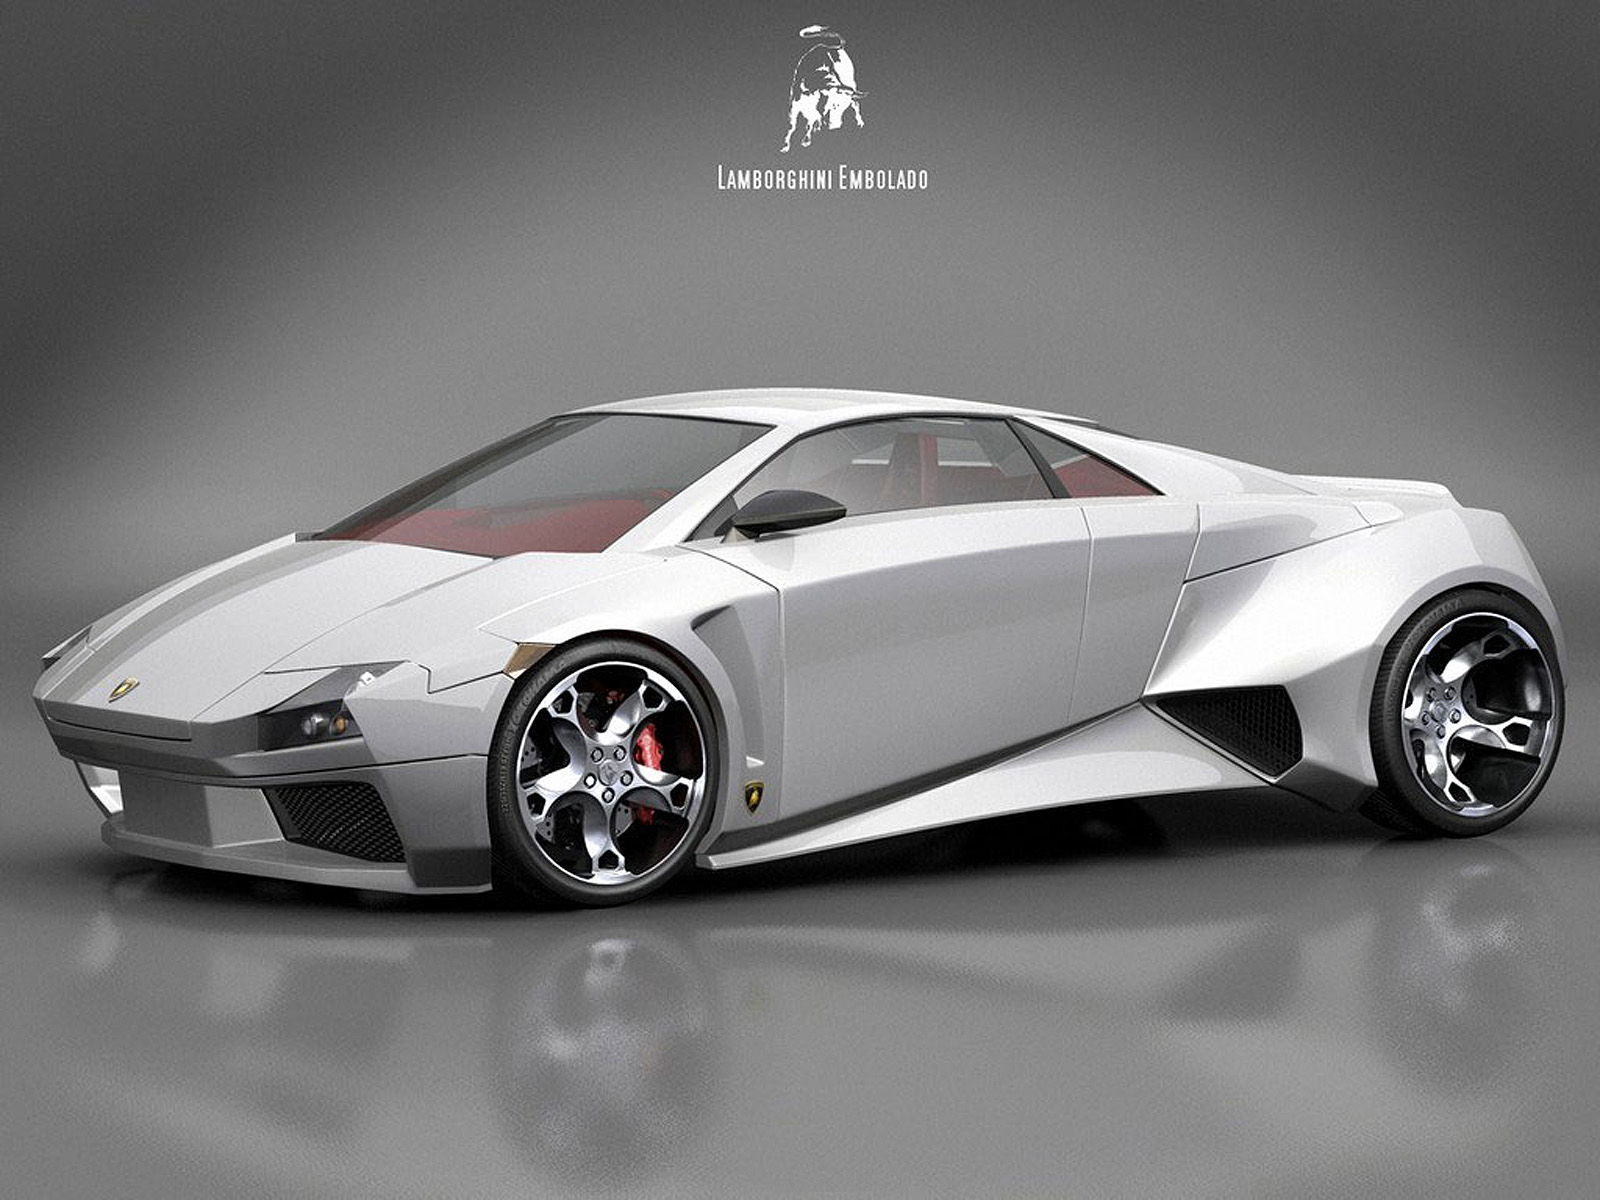 Lamborghini Embolado Blueprints